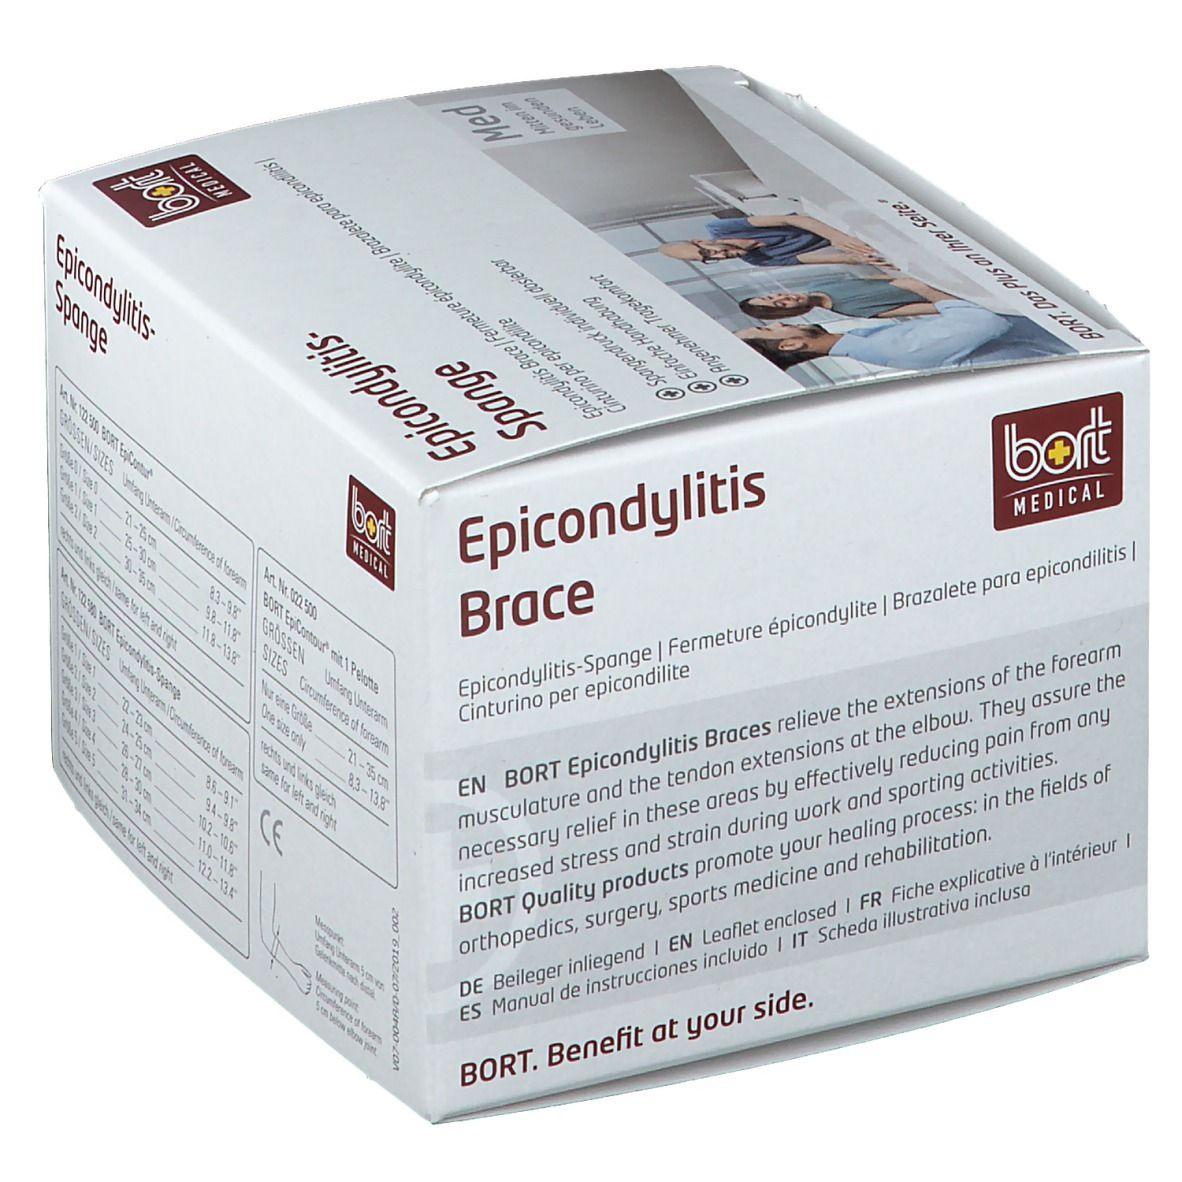 BORT Stabilo® Epicondylitis-Spange mit ulnarer Entlastung Gr. 2 grau